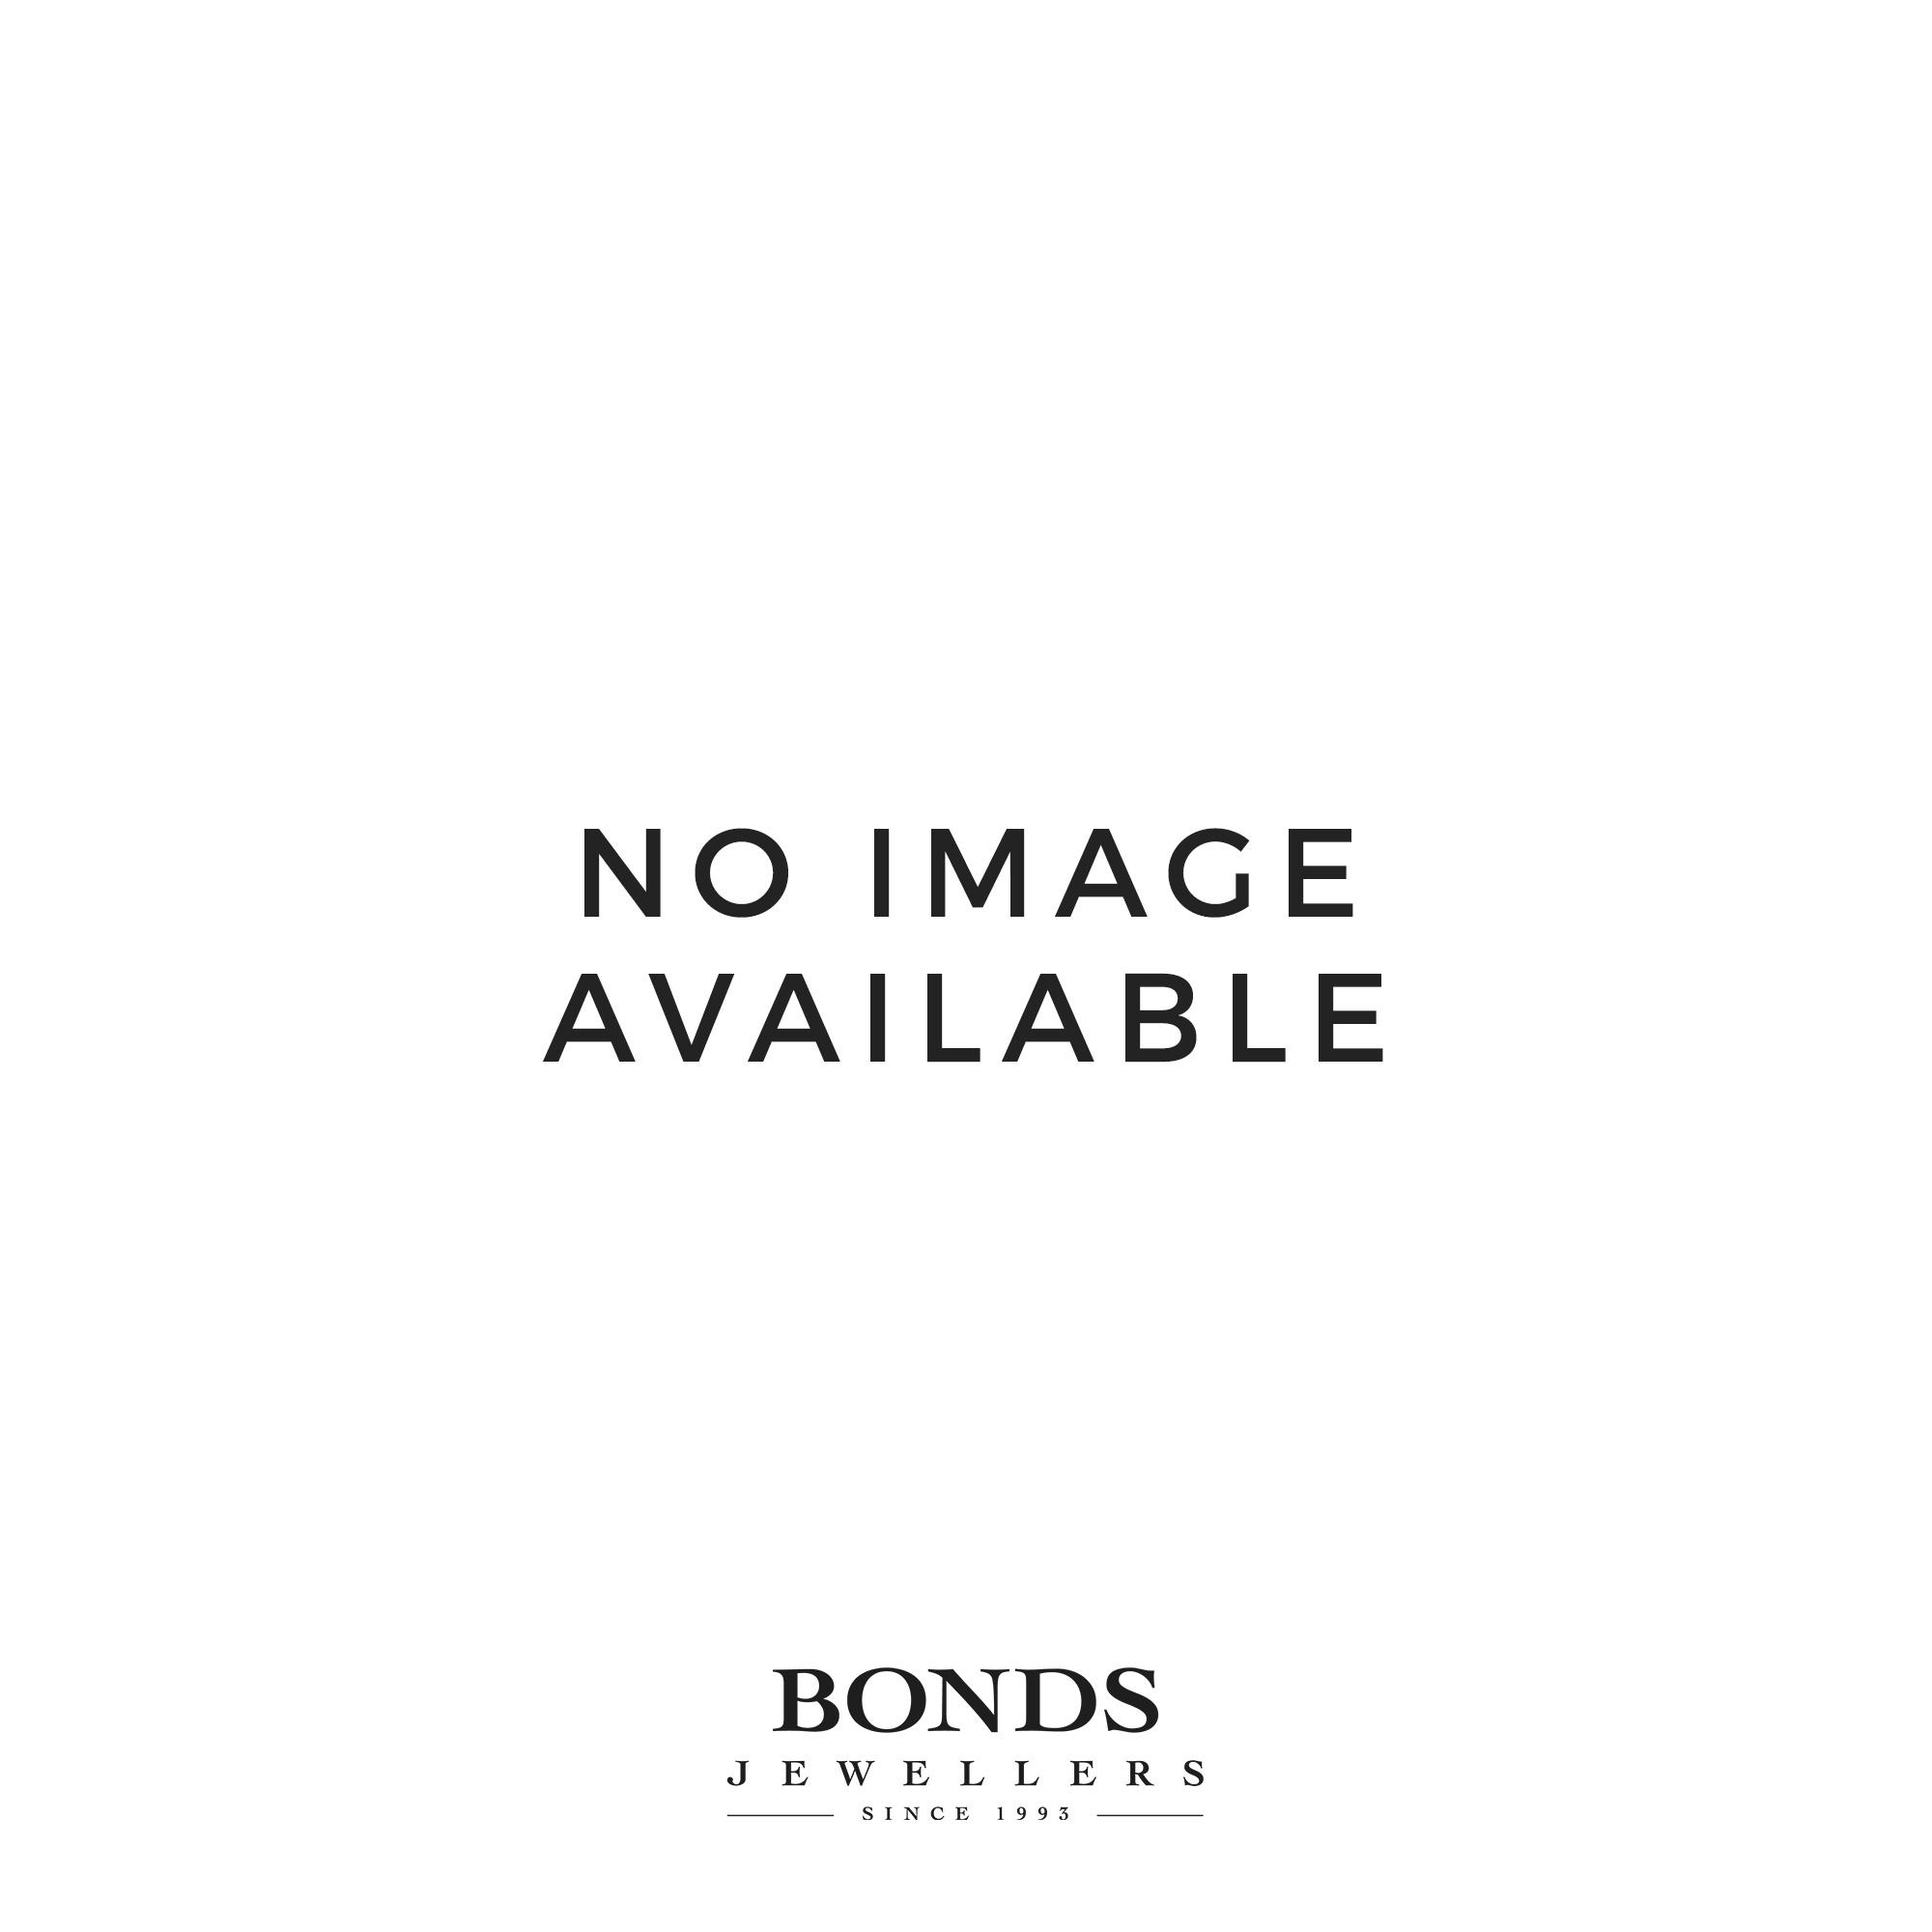 Lovelinks White Marble Murano Barrel 166 Bonds Jewellers